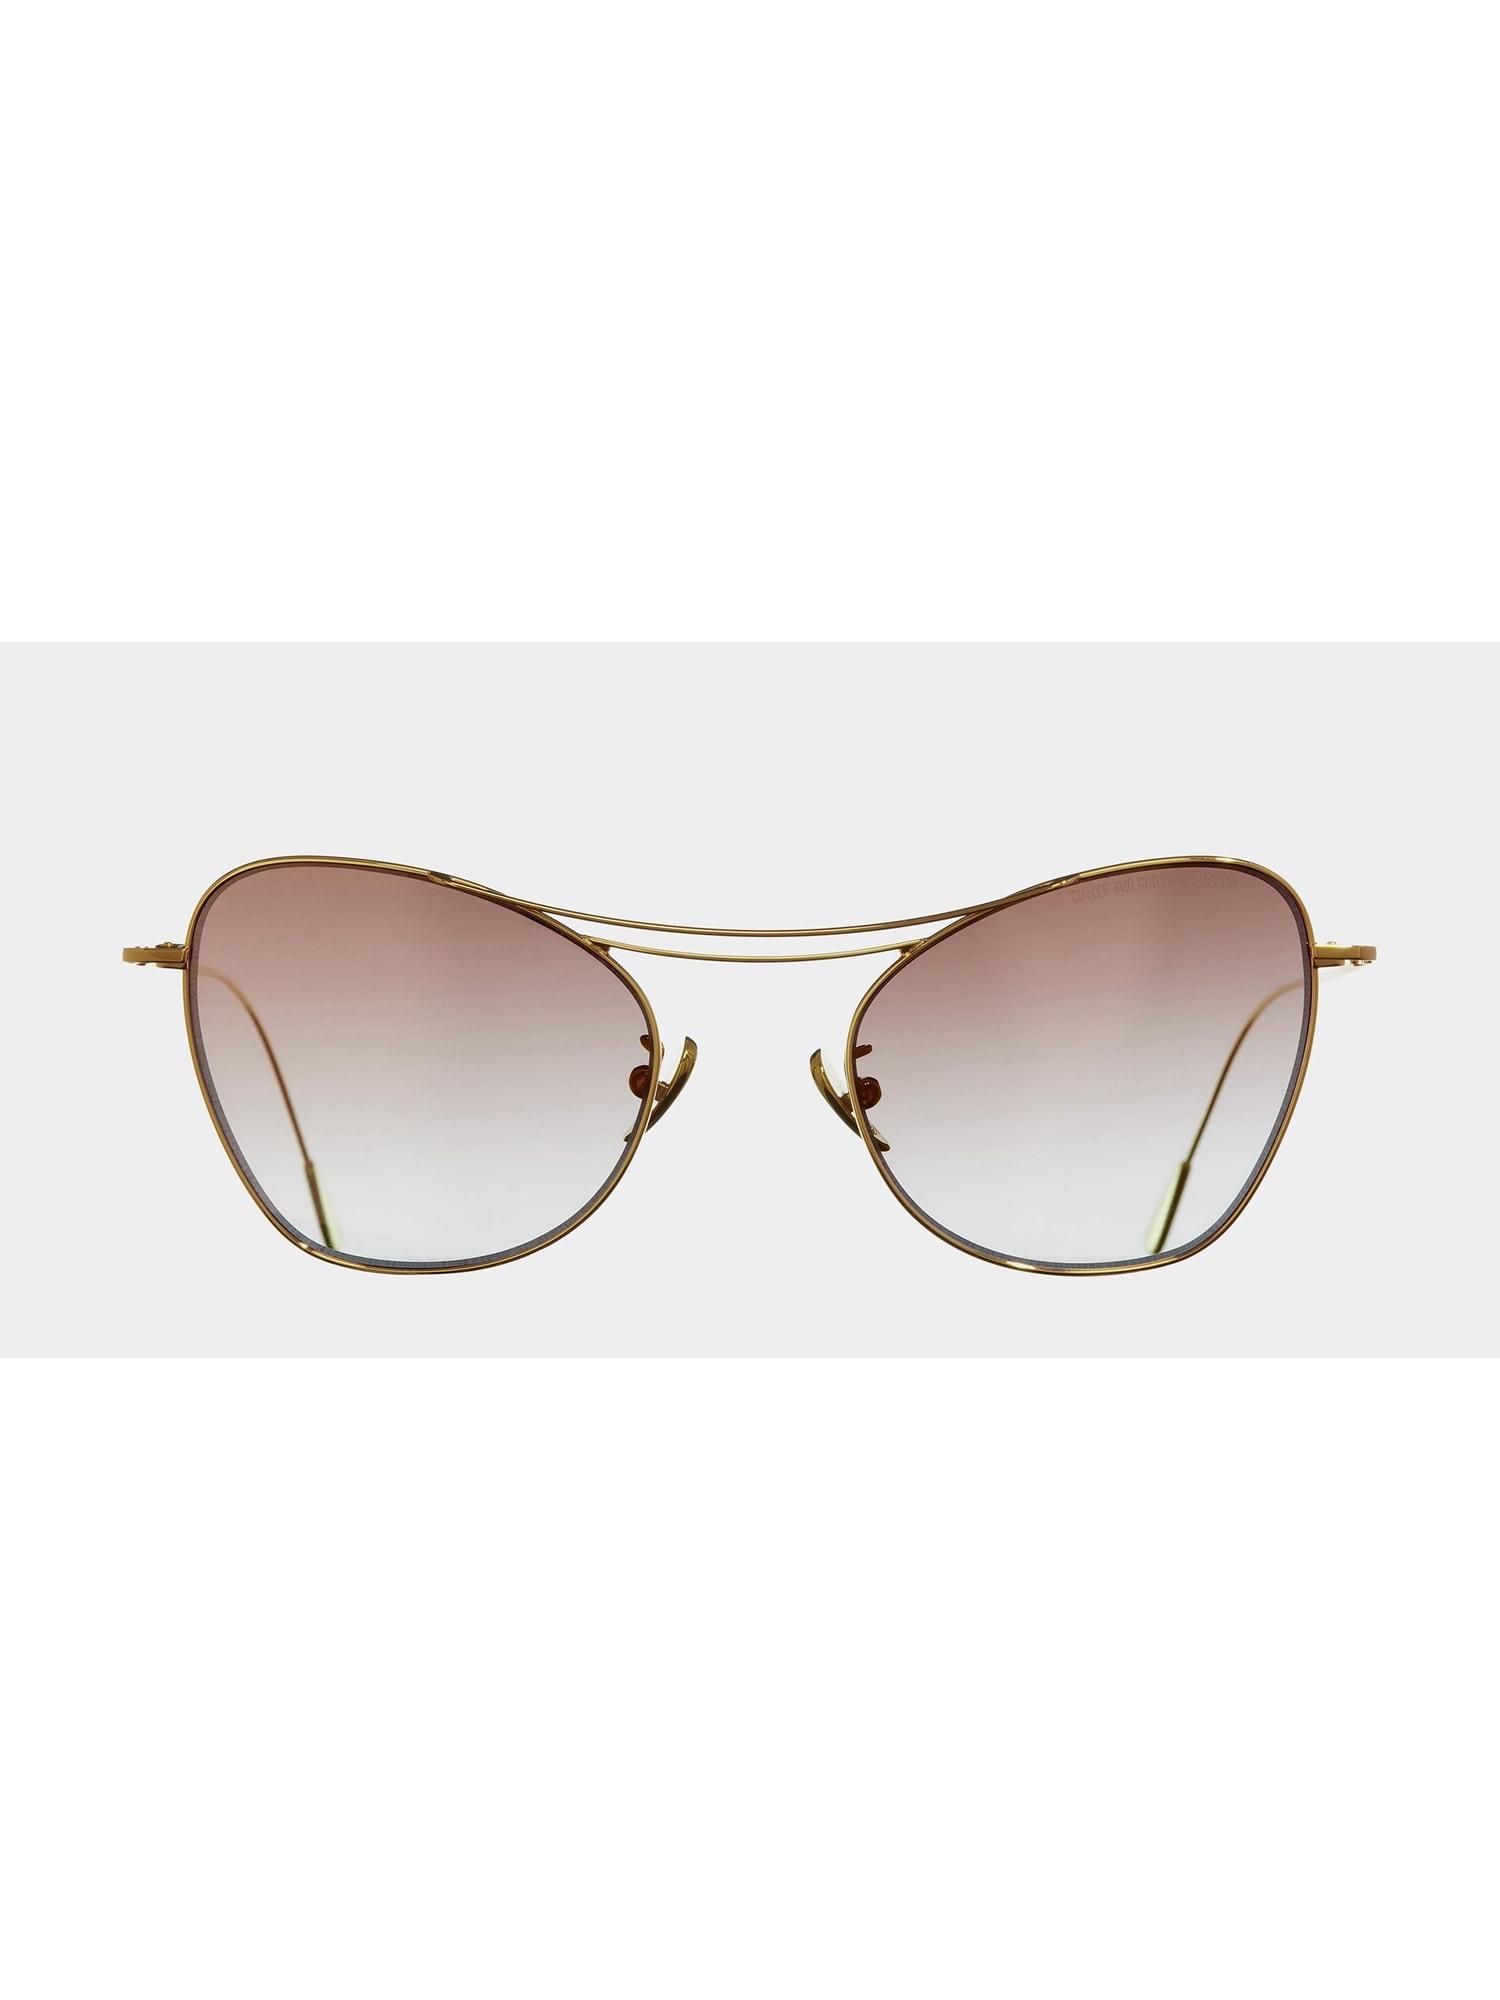 1307GPL/01 Eyewear